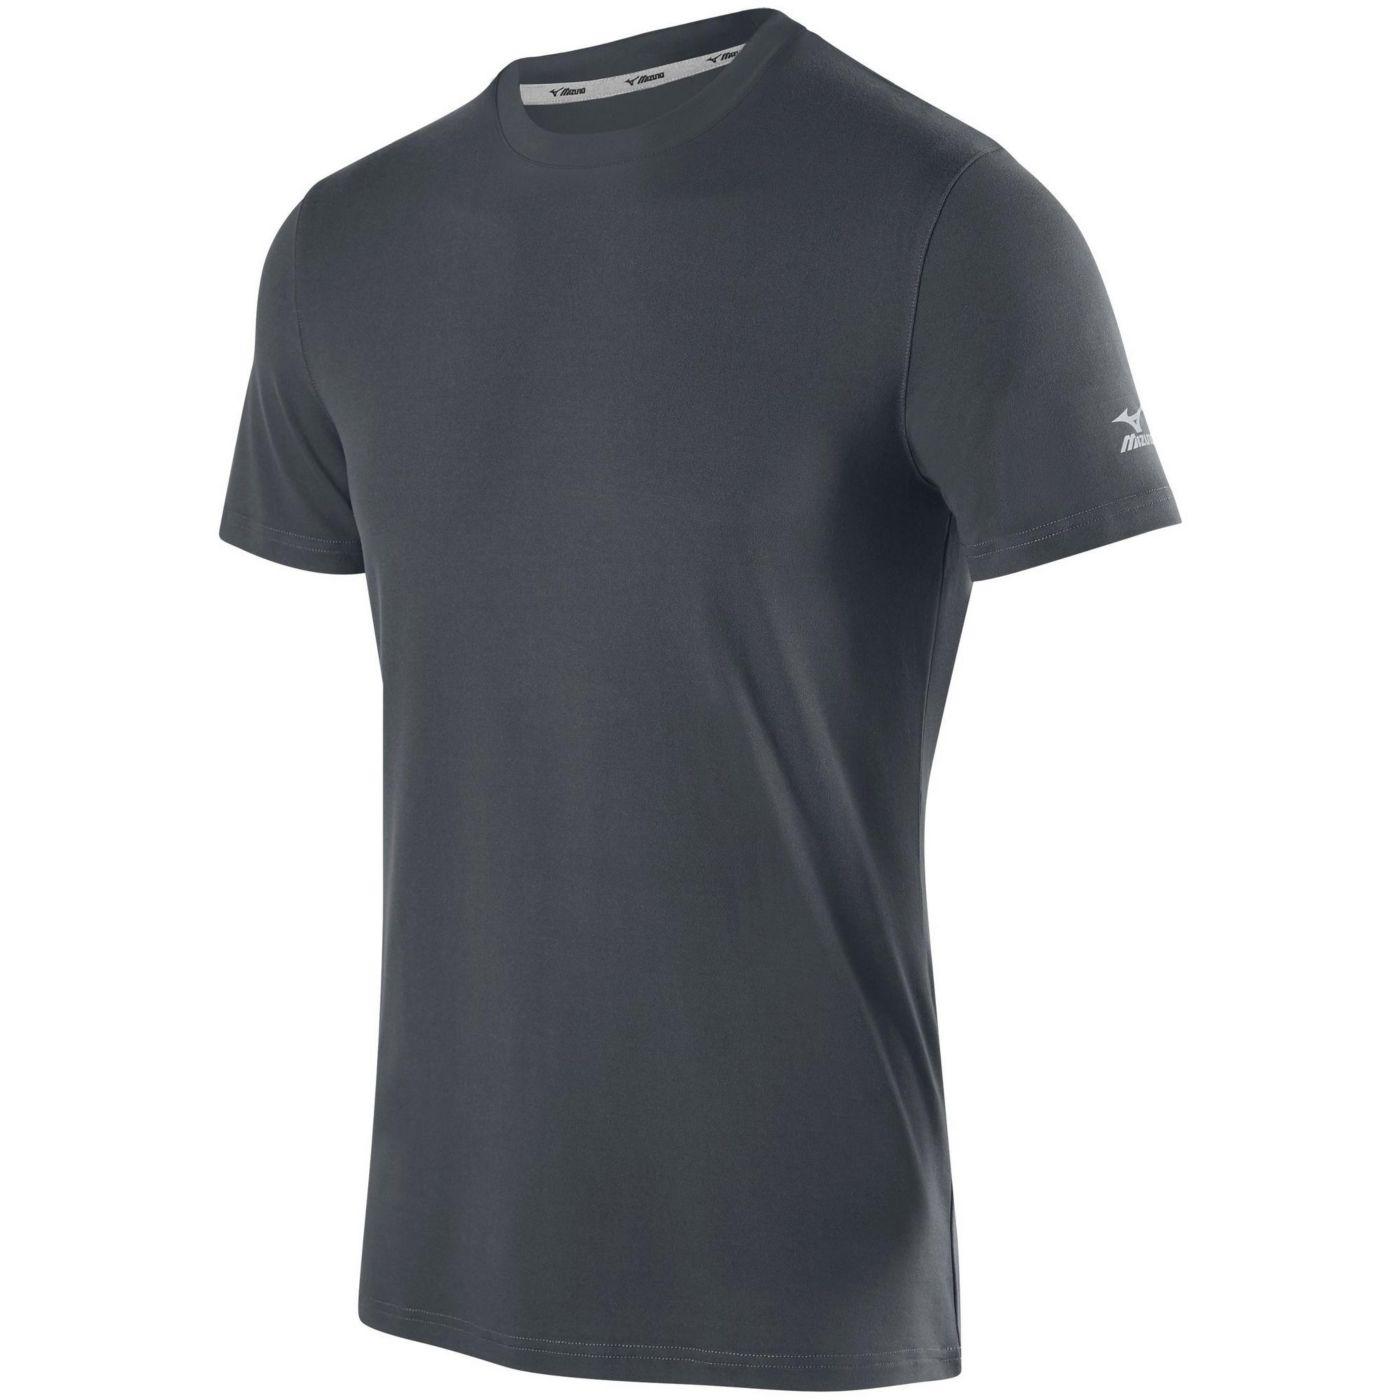 Mizuno Men's Volleyball Attack T-Shirt 2.0